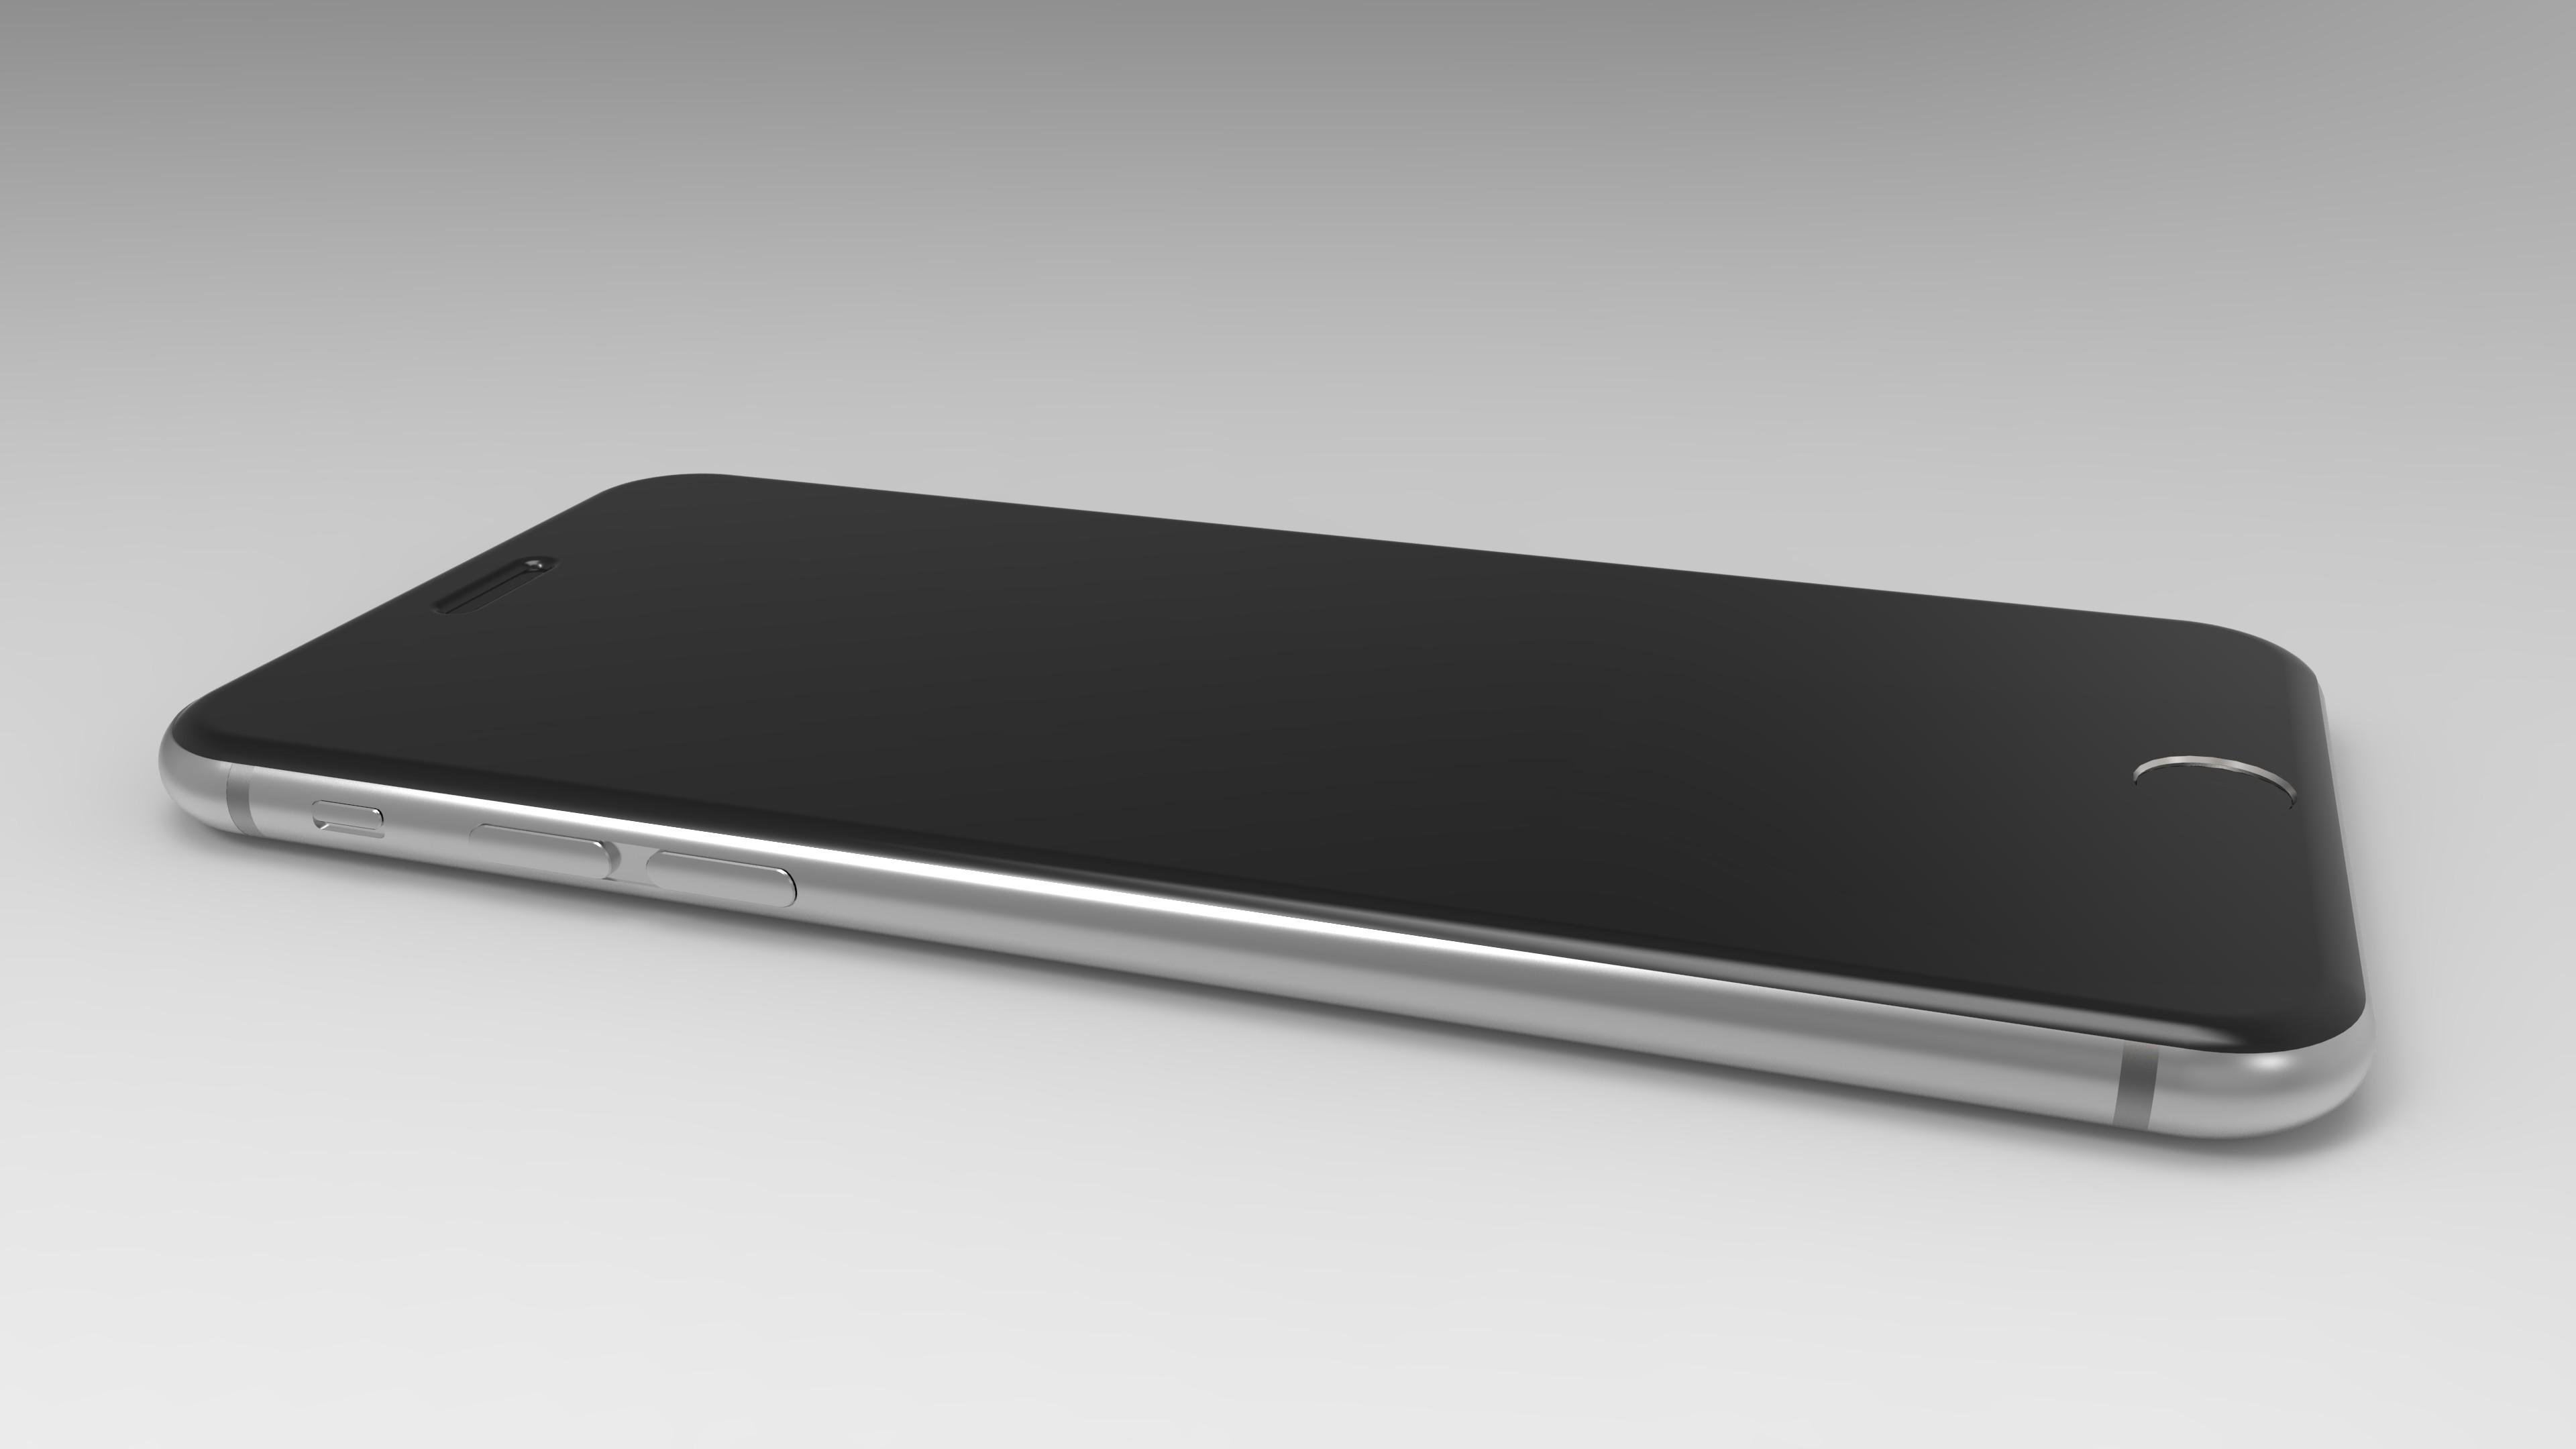 Iphone 6s Plus 4k Wallpaper: IPhone 6 4K Wallpaper (74+ Images